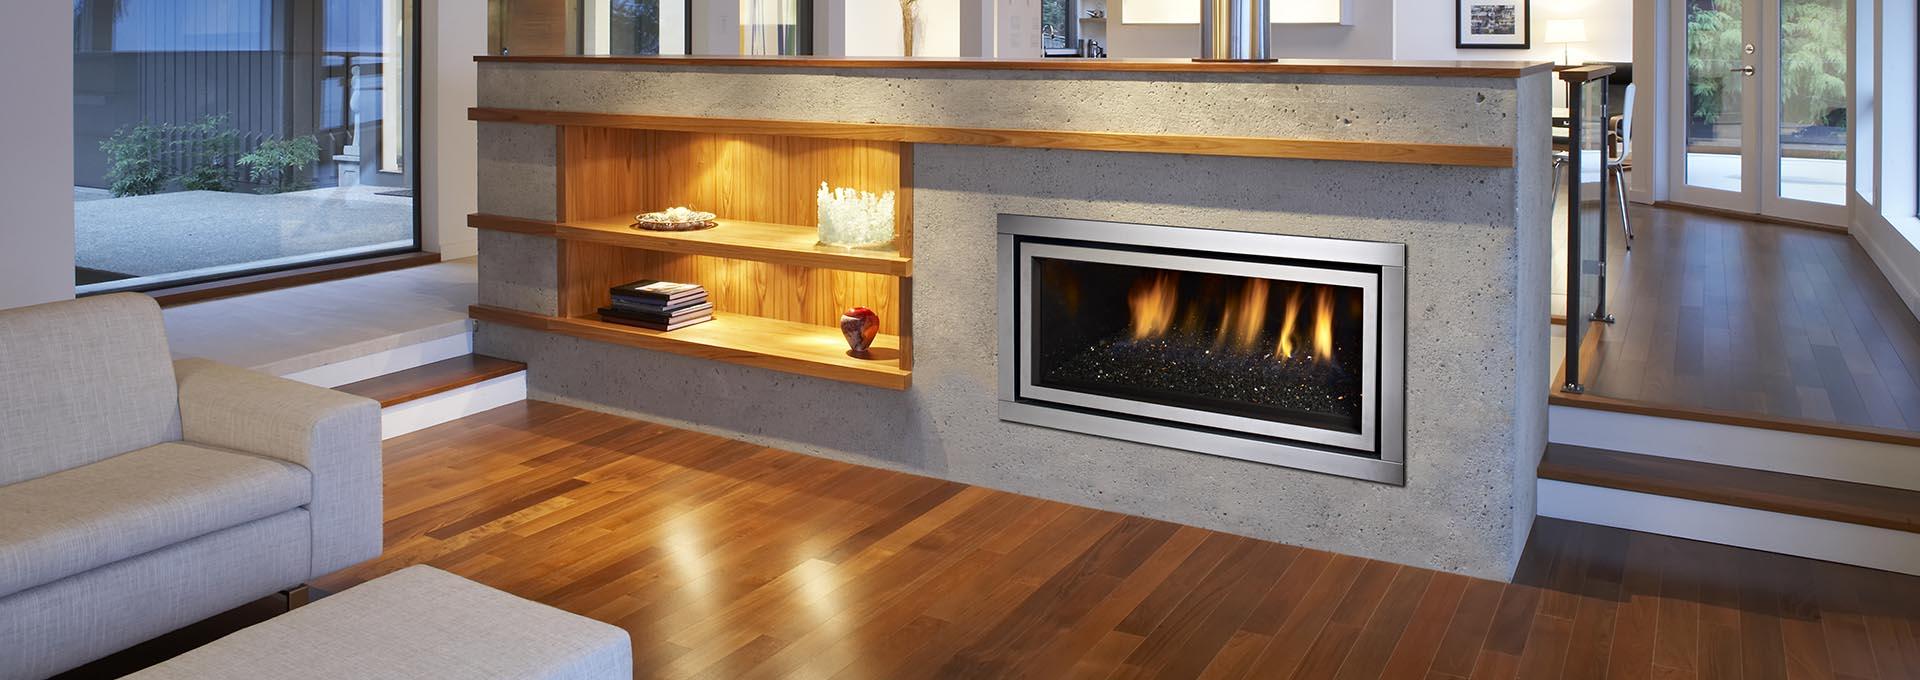 Regency Gas Fireplace Inserts